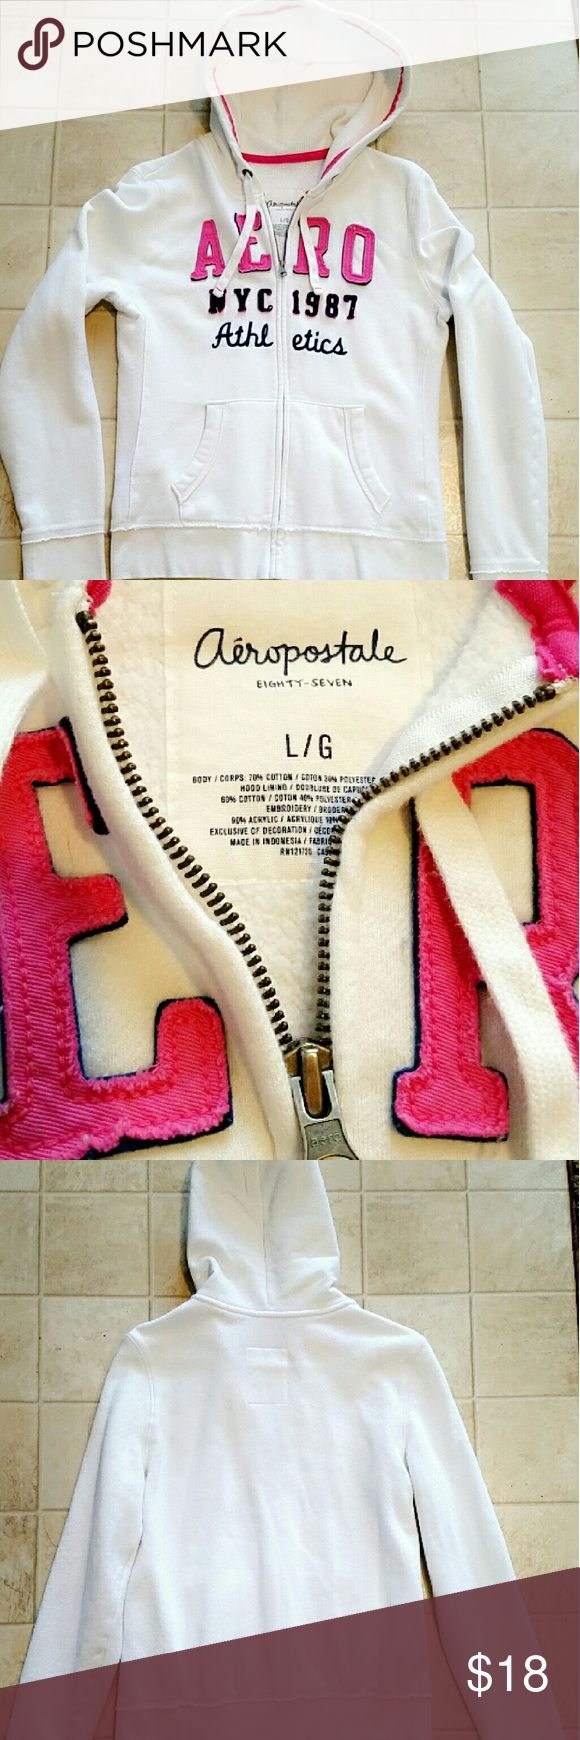 Aeropostale White zip up hoodie with pink Aeropostale White zip up hoodie with pink lettering. Great condition. Size L Aeropostale Tops Sweatshirts & Hoodies